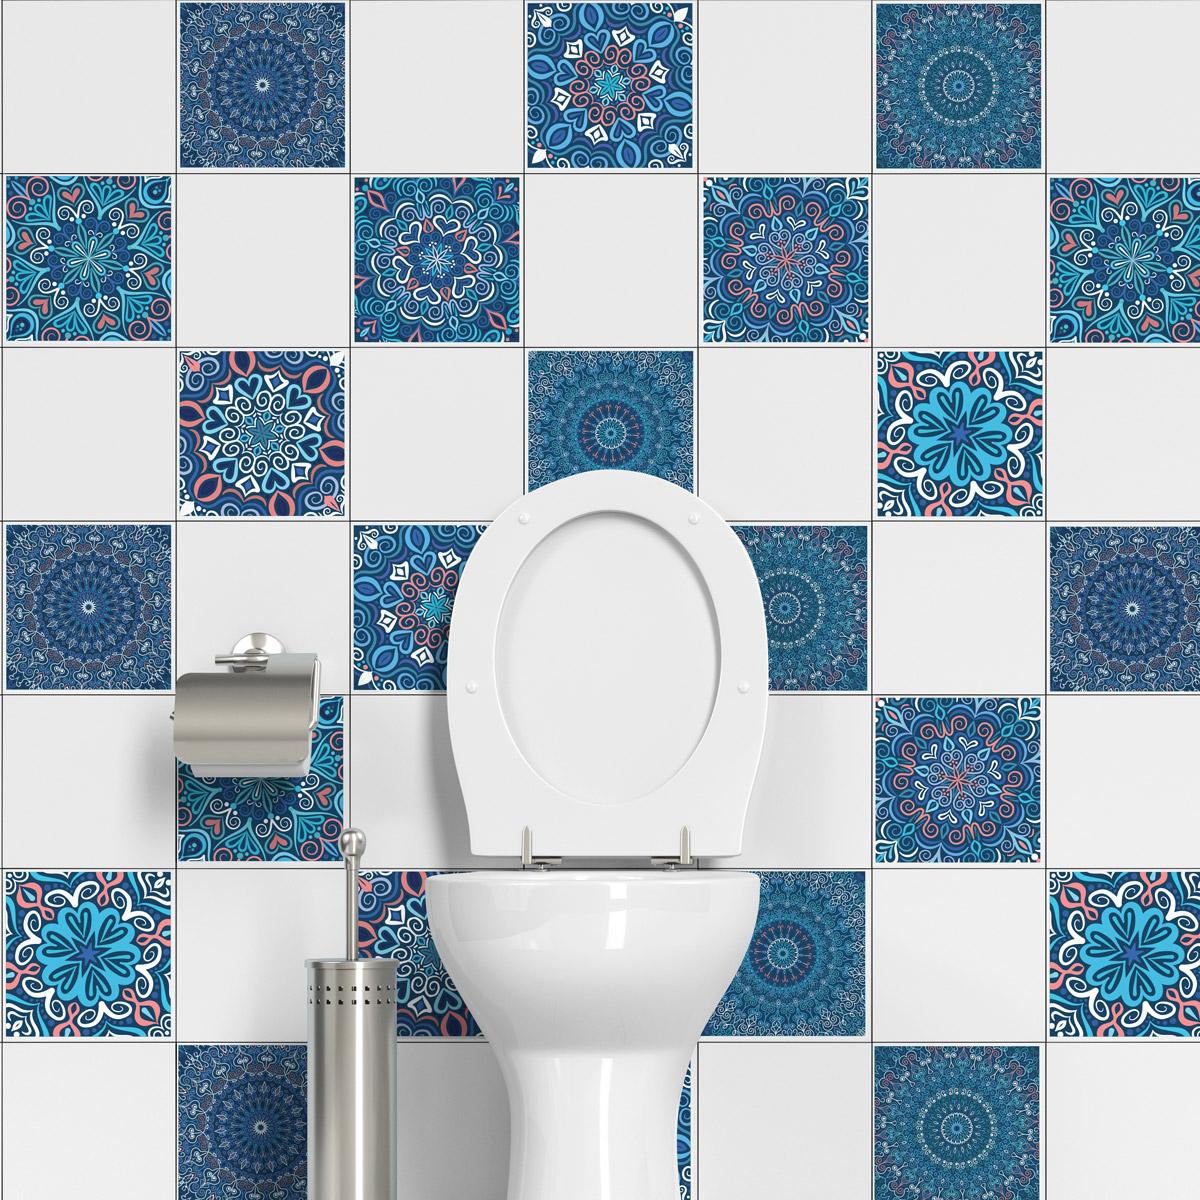 24 stickers carrelages azulejos ornements m diterran en art et design artistiques ambiance. Black Bedroom Furniture Sets. Home Design Ideas